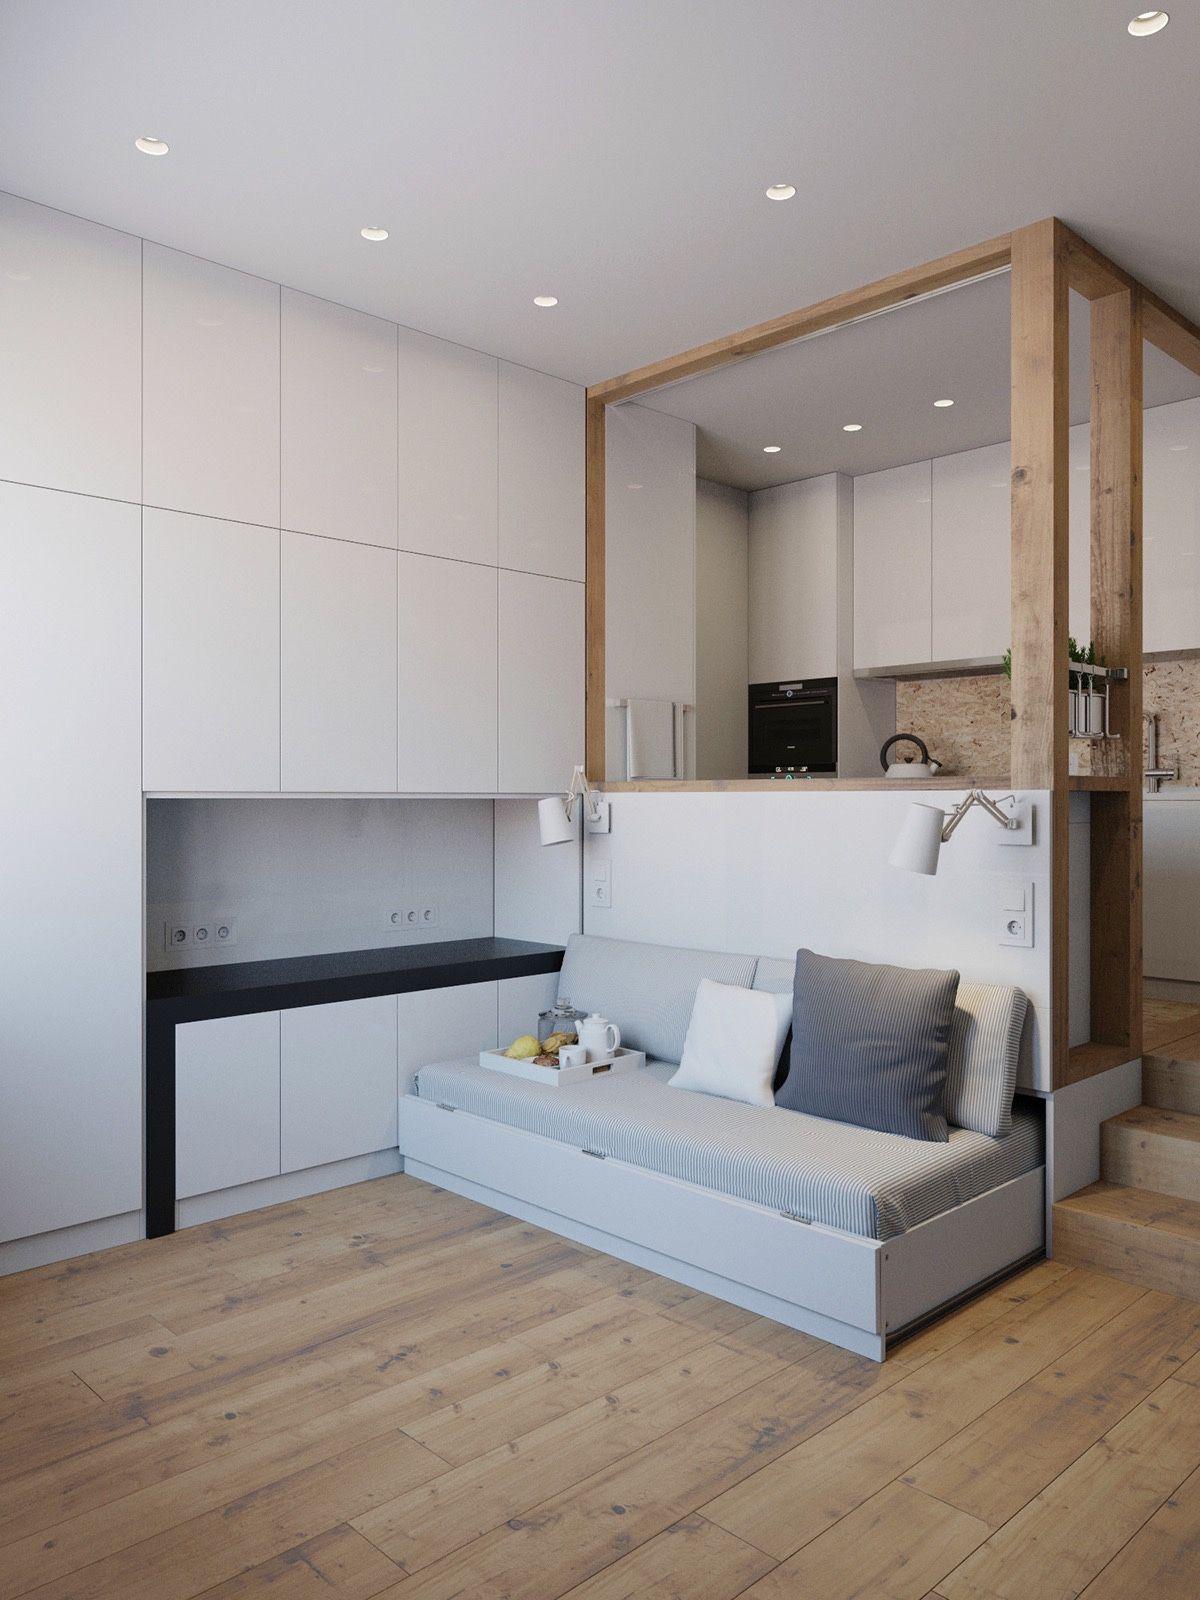 4 Small Apartment Designs Under 50 Square Meters | Salones de diseño ...